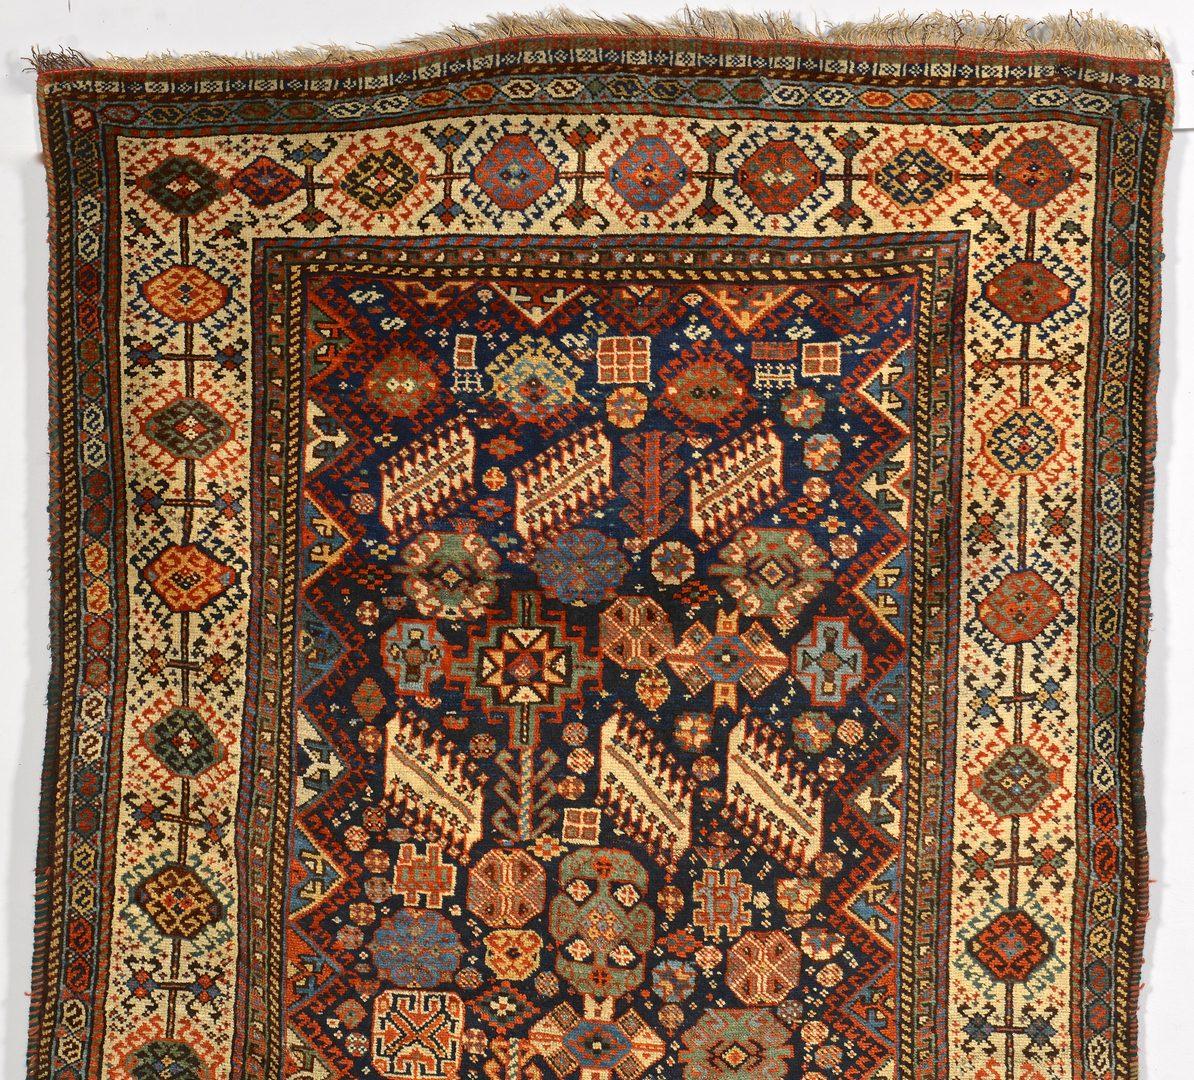 Lot 365: Antique South Persian Lori area rug